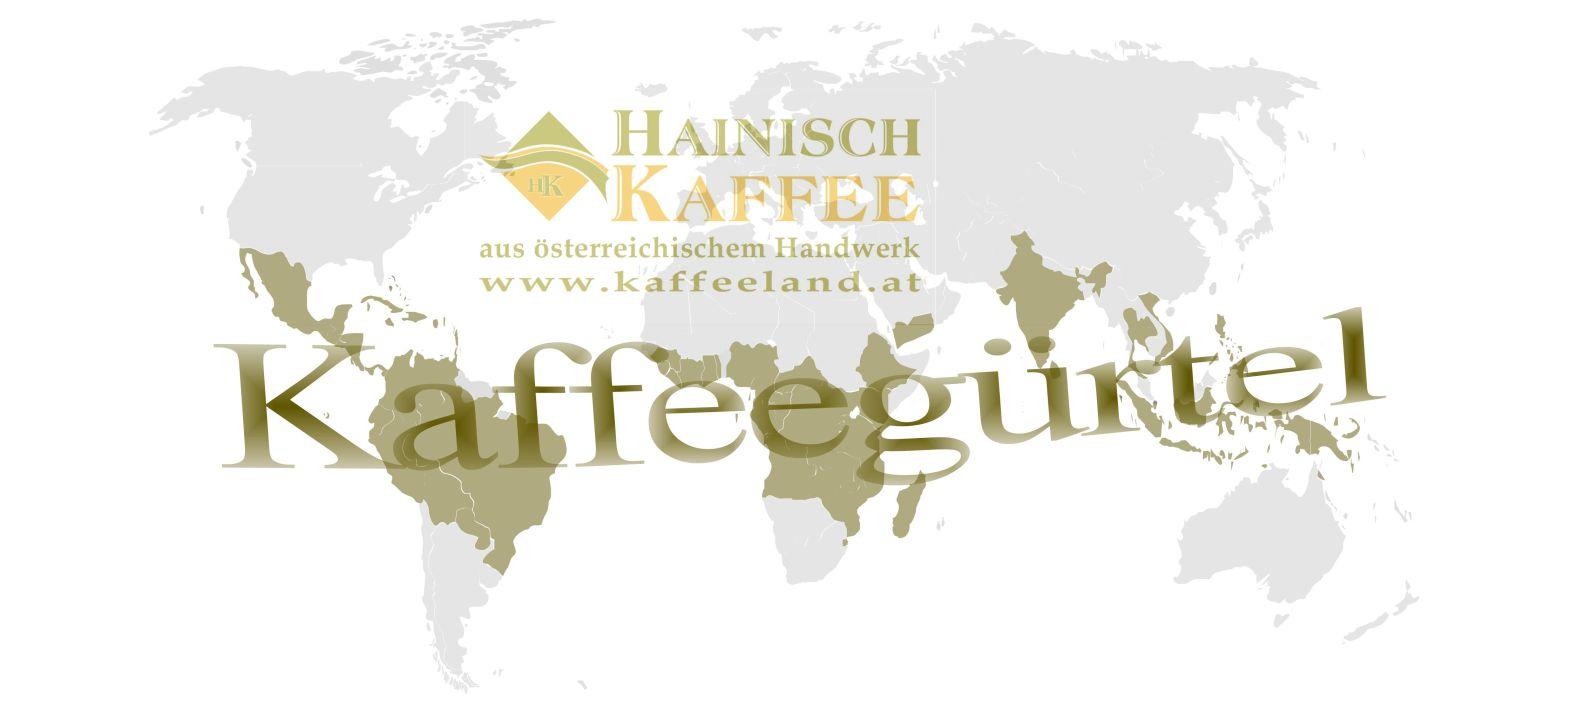 Weltkarte mit Kaffeegürtel